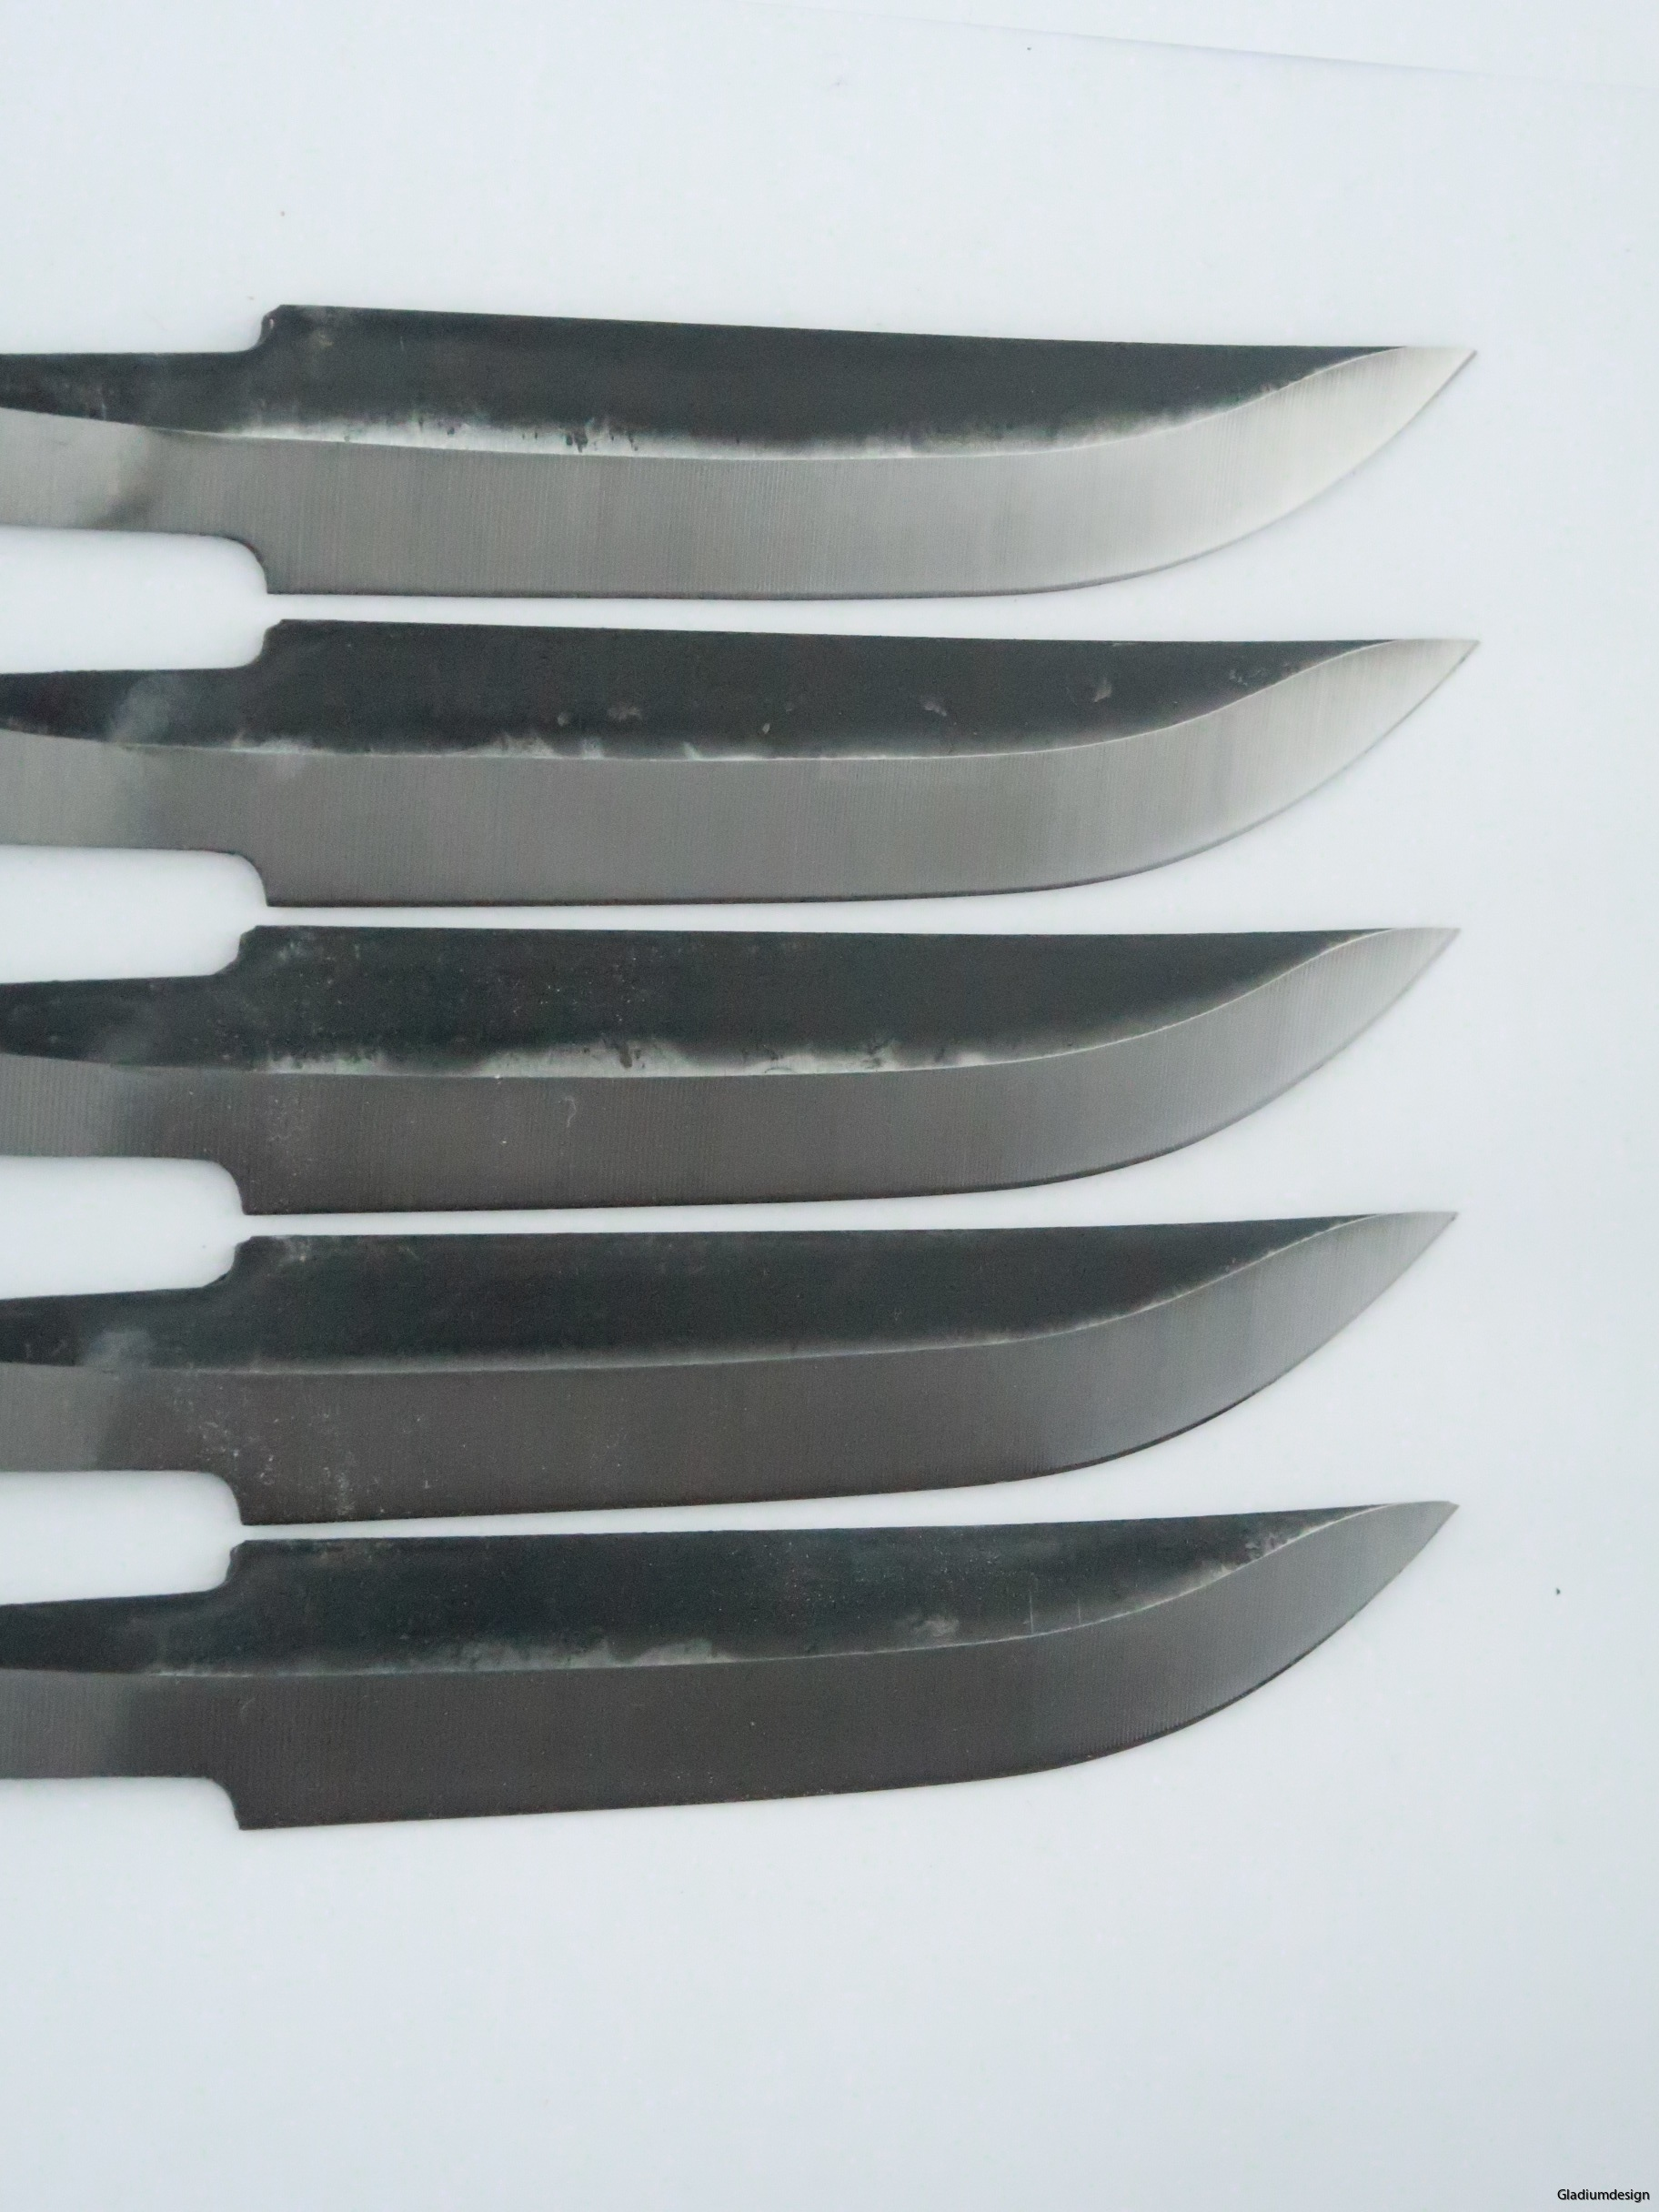 Billiga knivblad